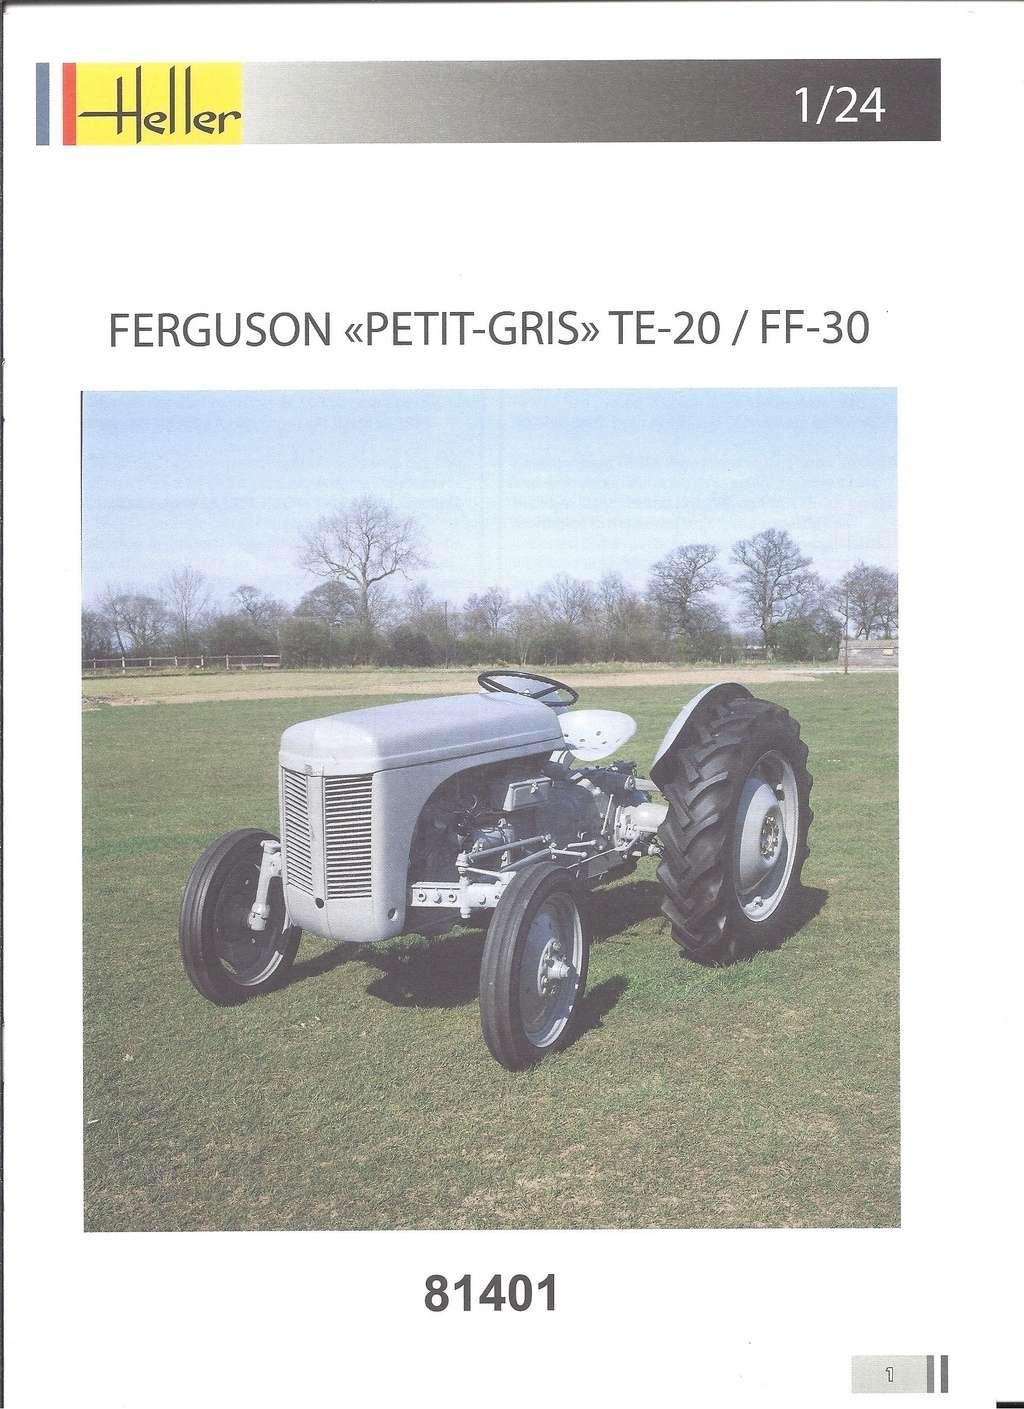 FERGUSSON TE 20 - FF 30 Réf 81401 1/24ème  Hell1821